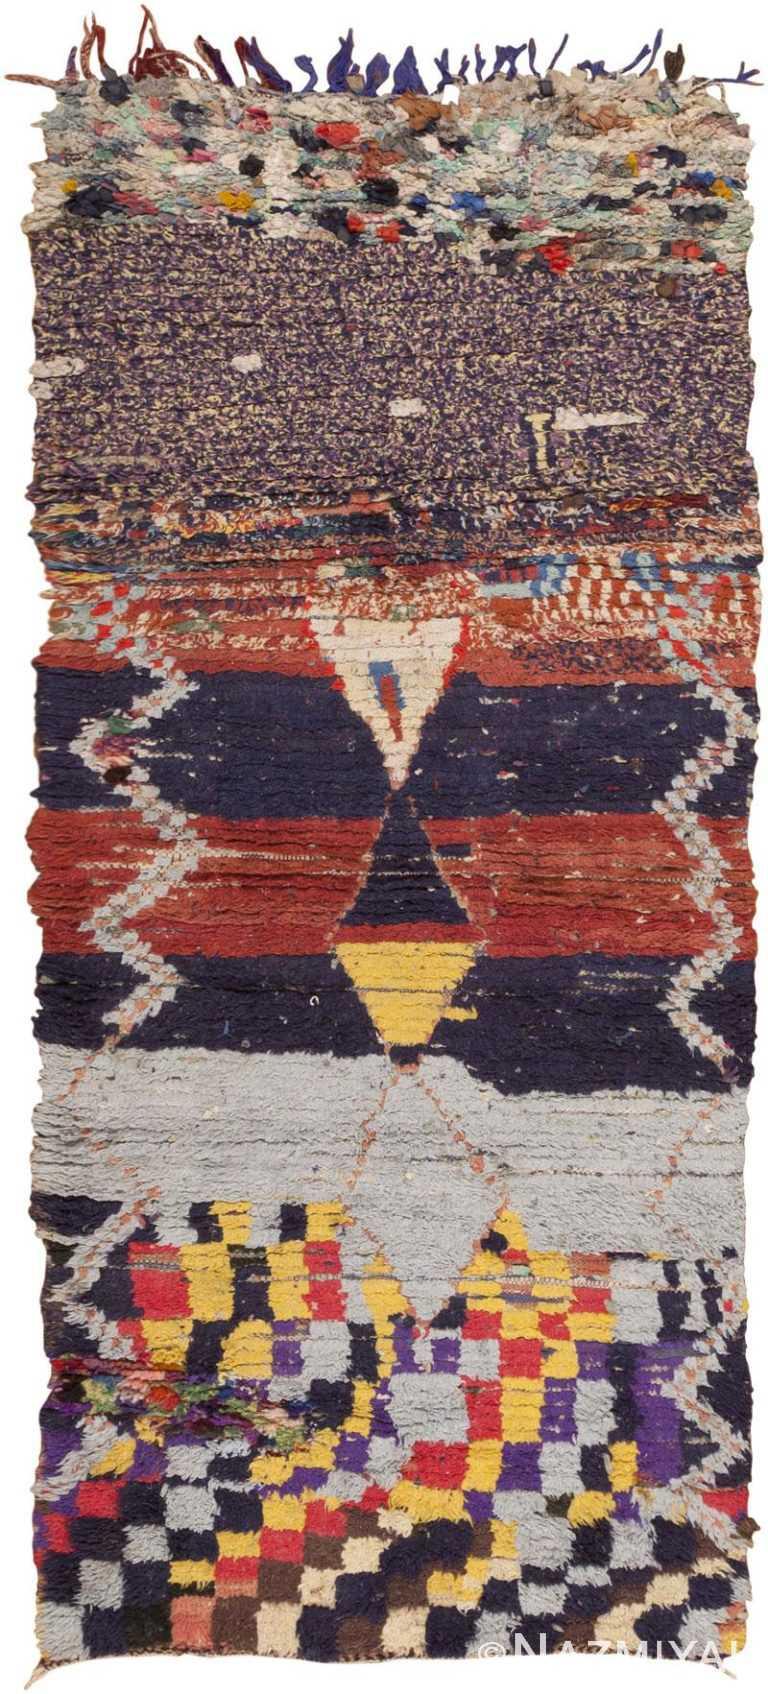 Vintage Tribal Moroccan Colorful Rug #45731 by Nazmiyal Antique Rugs